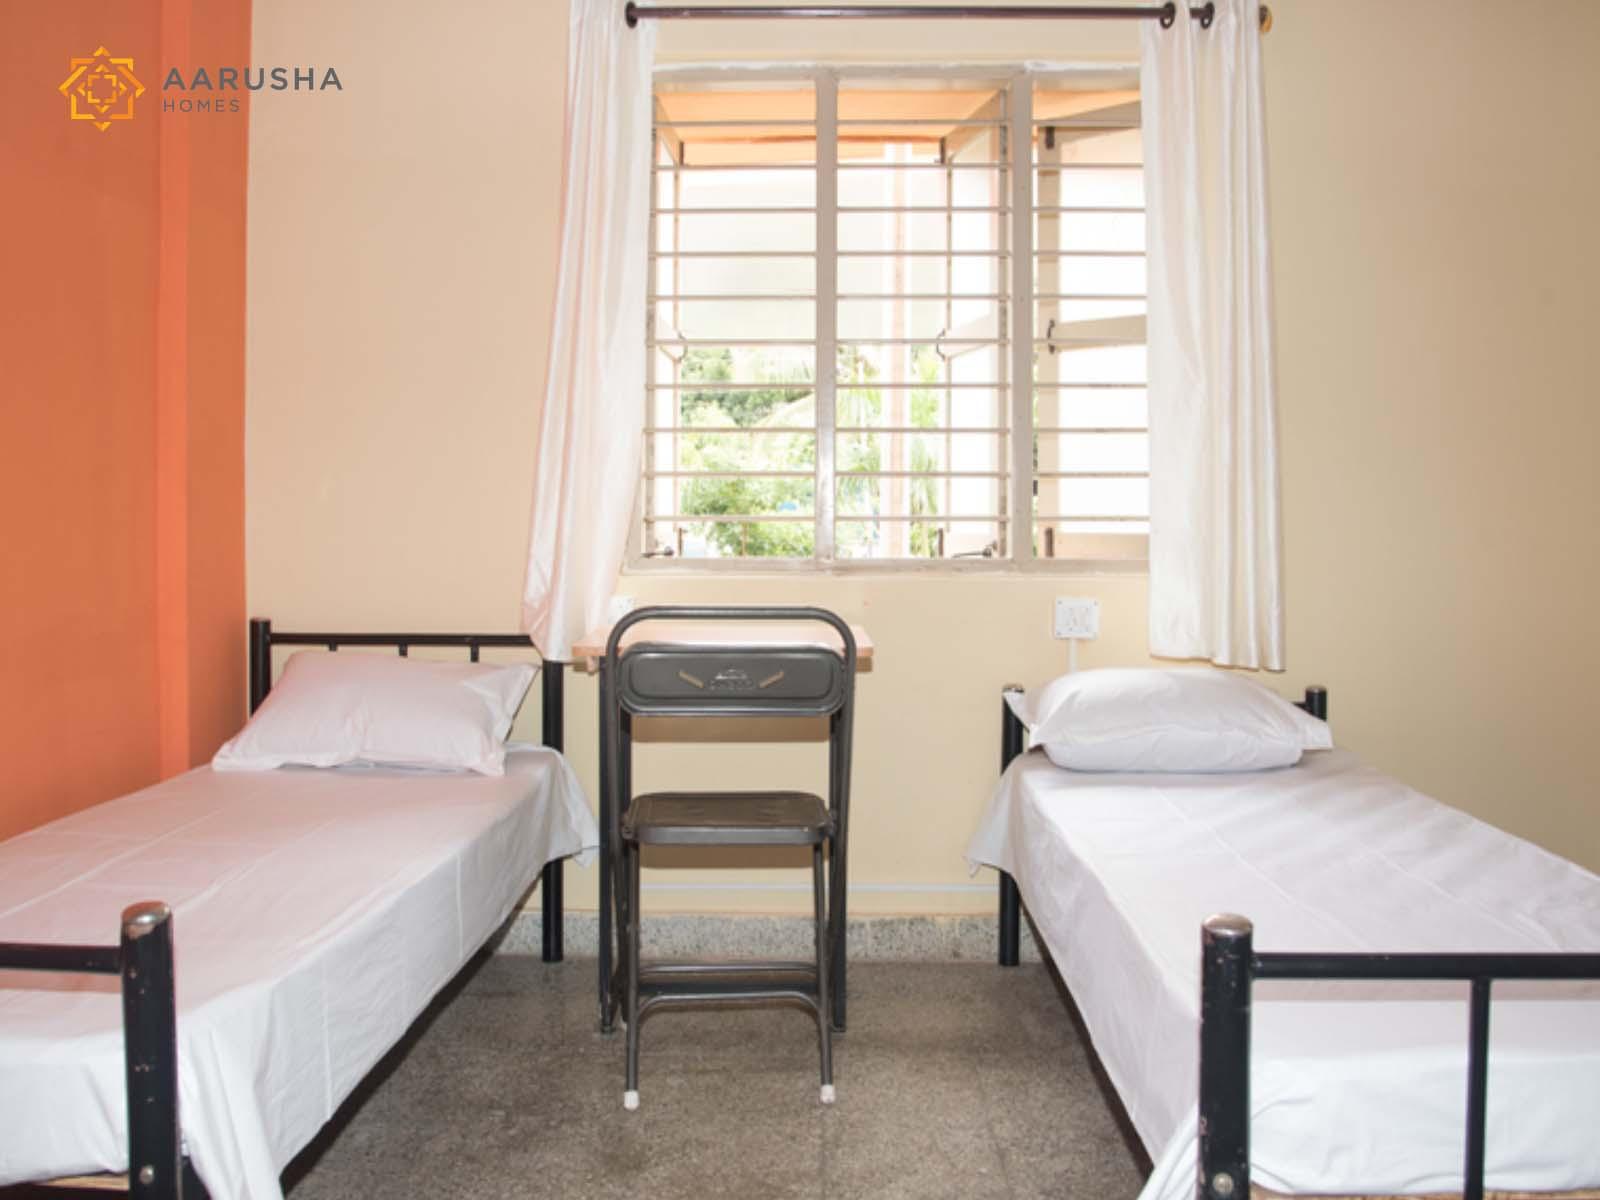 Men's PG & Hostel In Hoodi, Whitefield, Bangalore